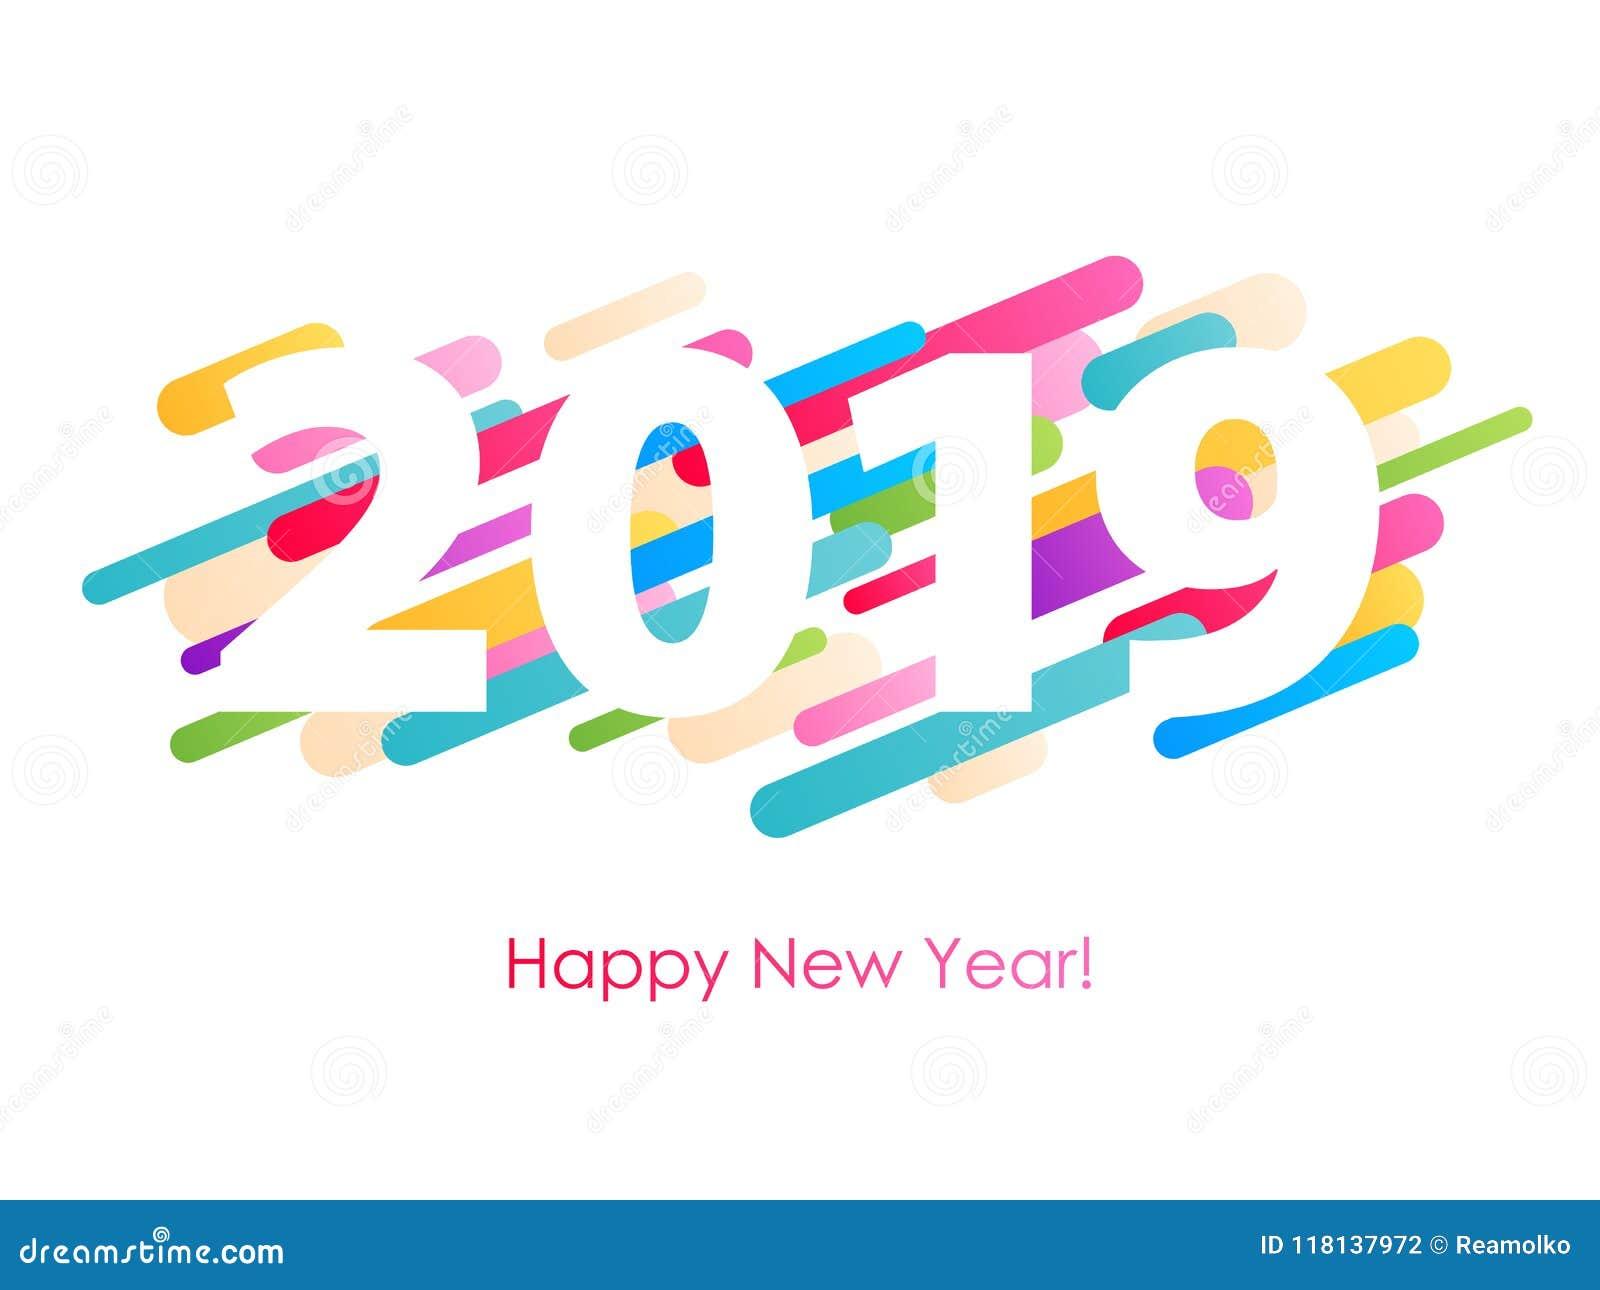 2019 happy new year background seasonal greeting card template